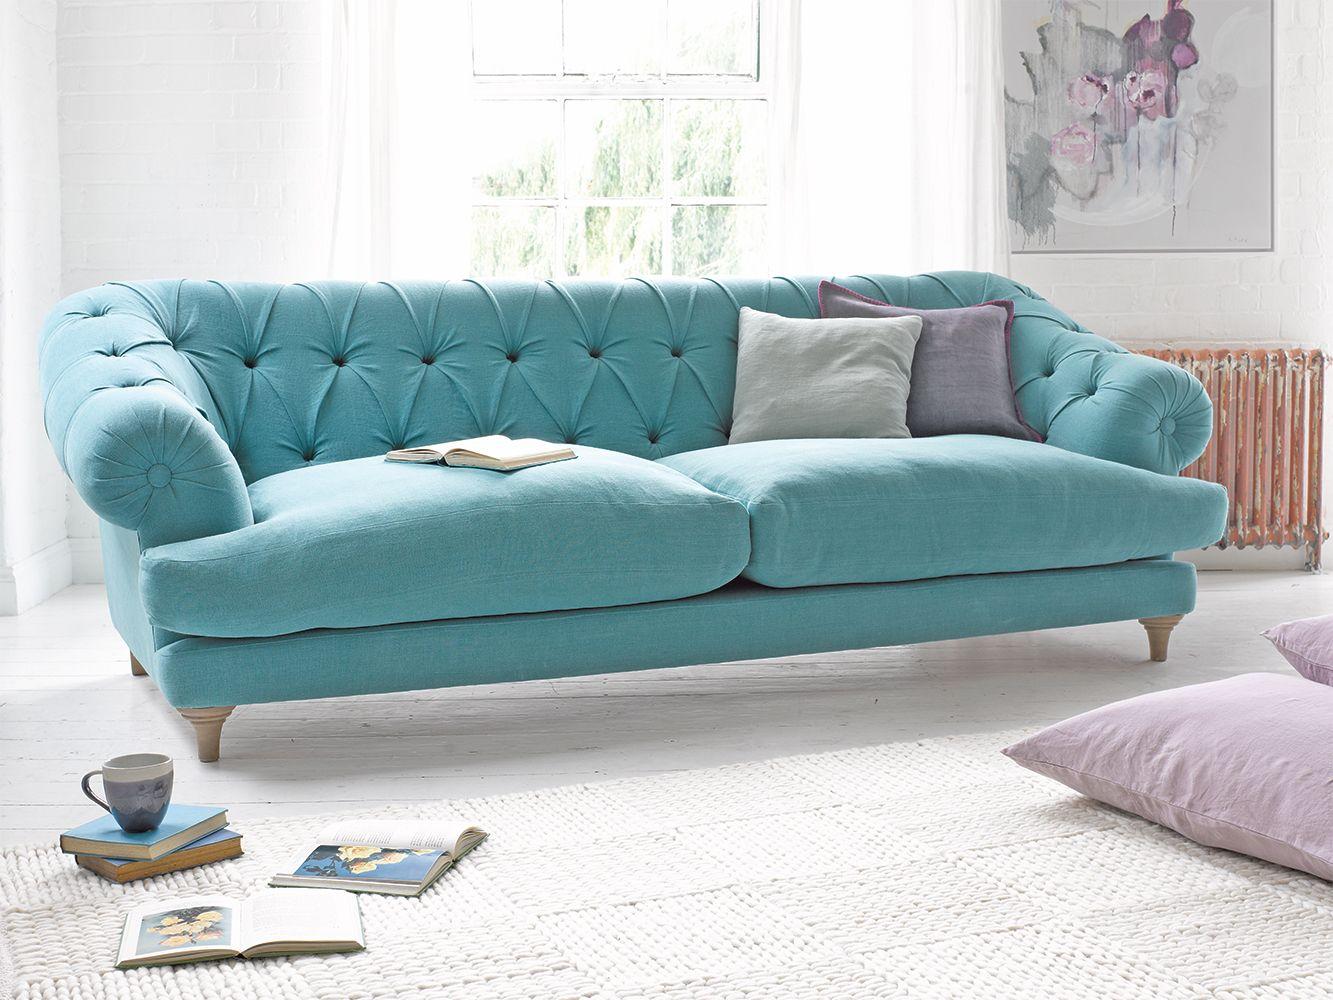 Bagsie Sofa Chesterfield Style Sofa Sofa Sofa Inspiration